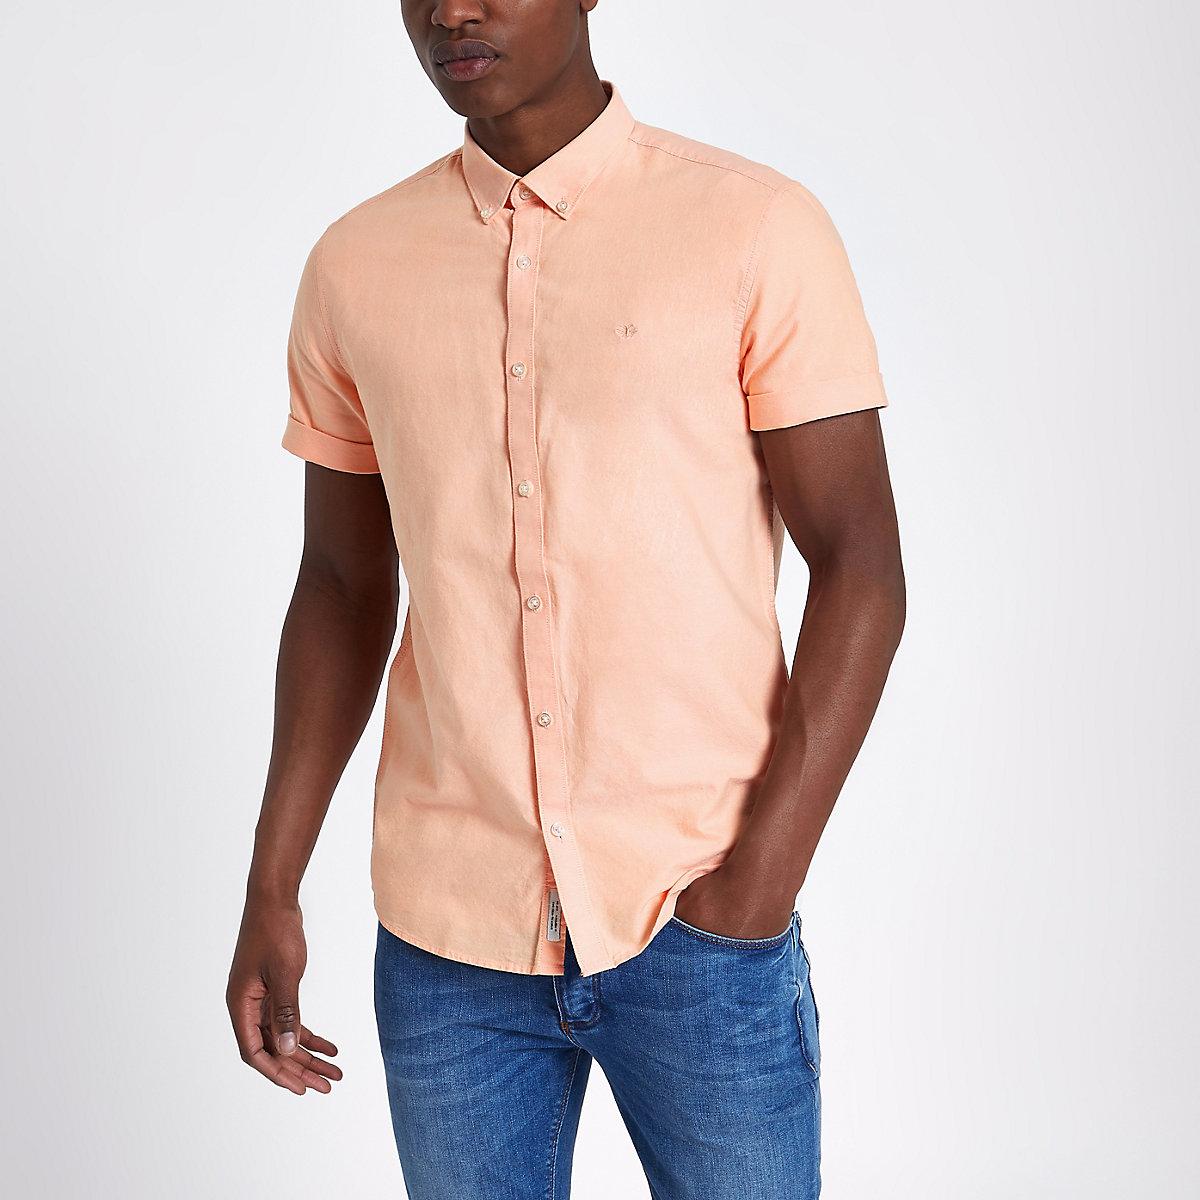 Peach orange short sleeve Oxford shirt